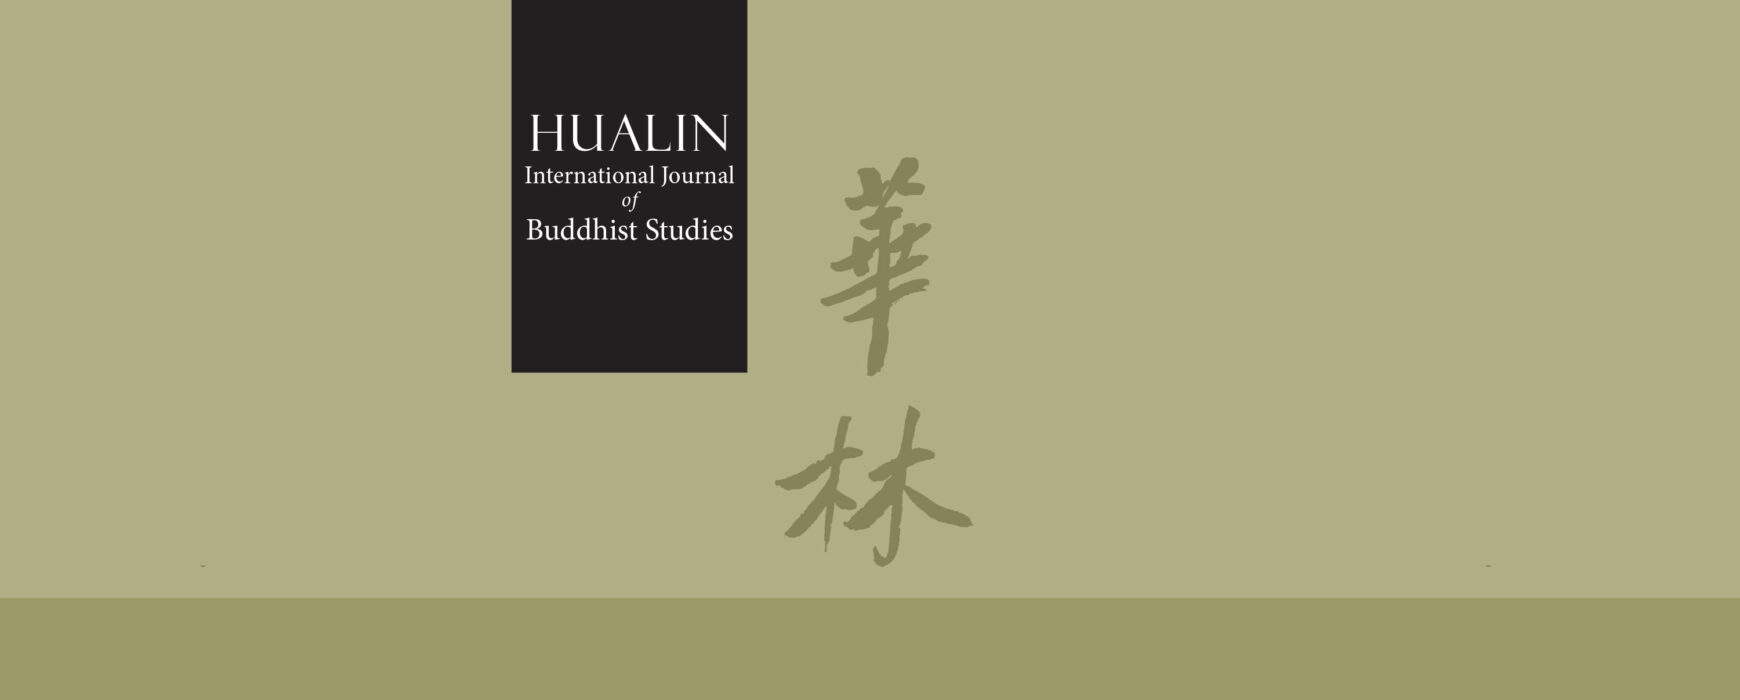 Launch of Hualin International Journal of Buddhist Studies (HIJBS)